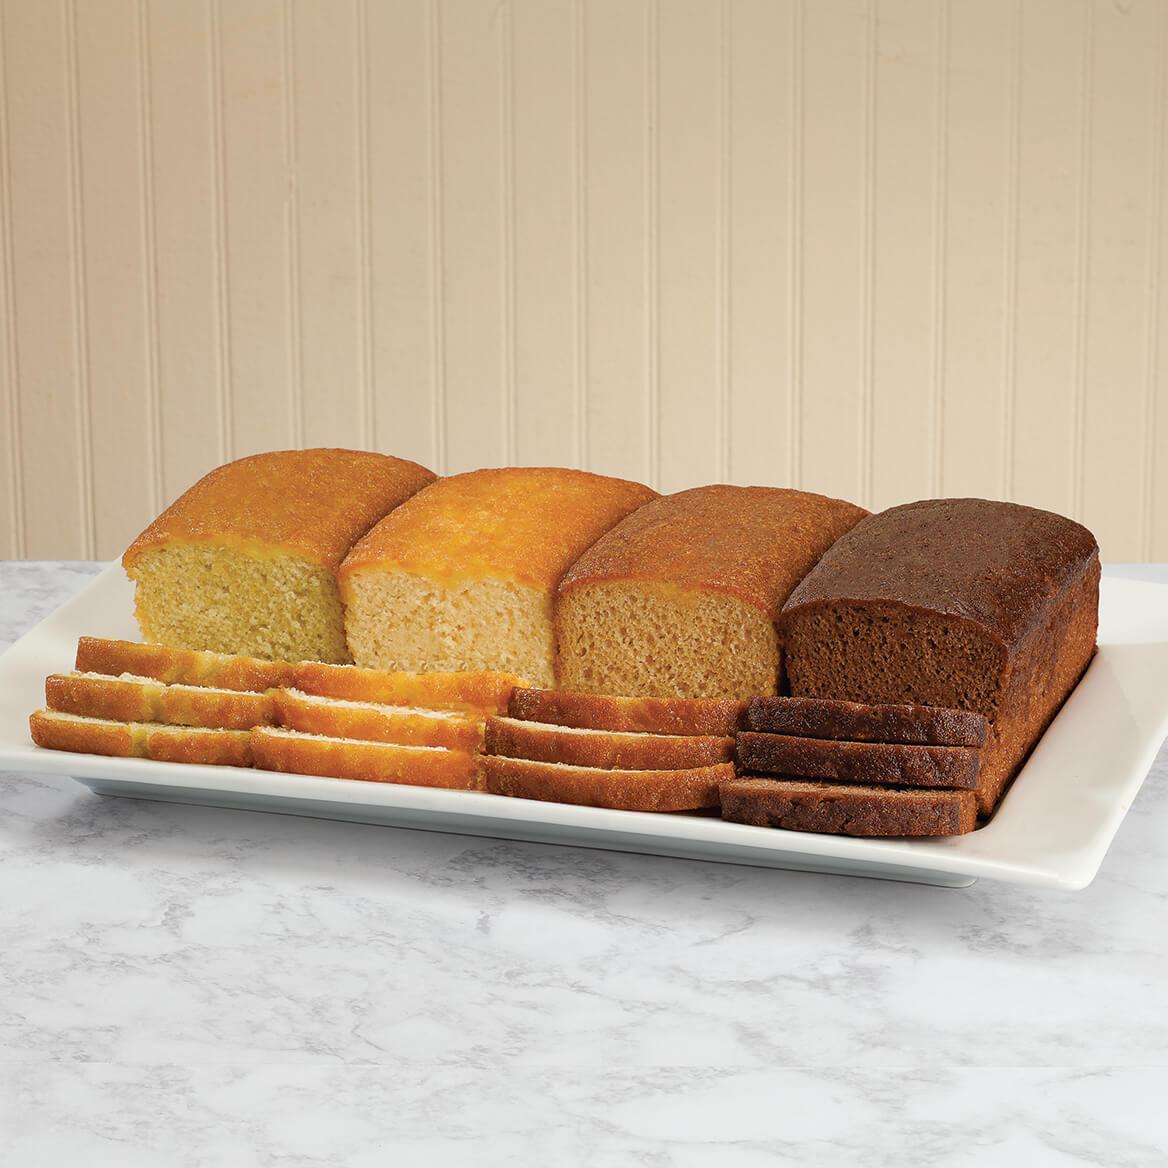 Chocolate Merlot Dessert Cake, 14 oz.-368799